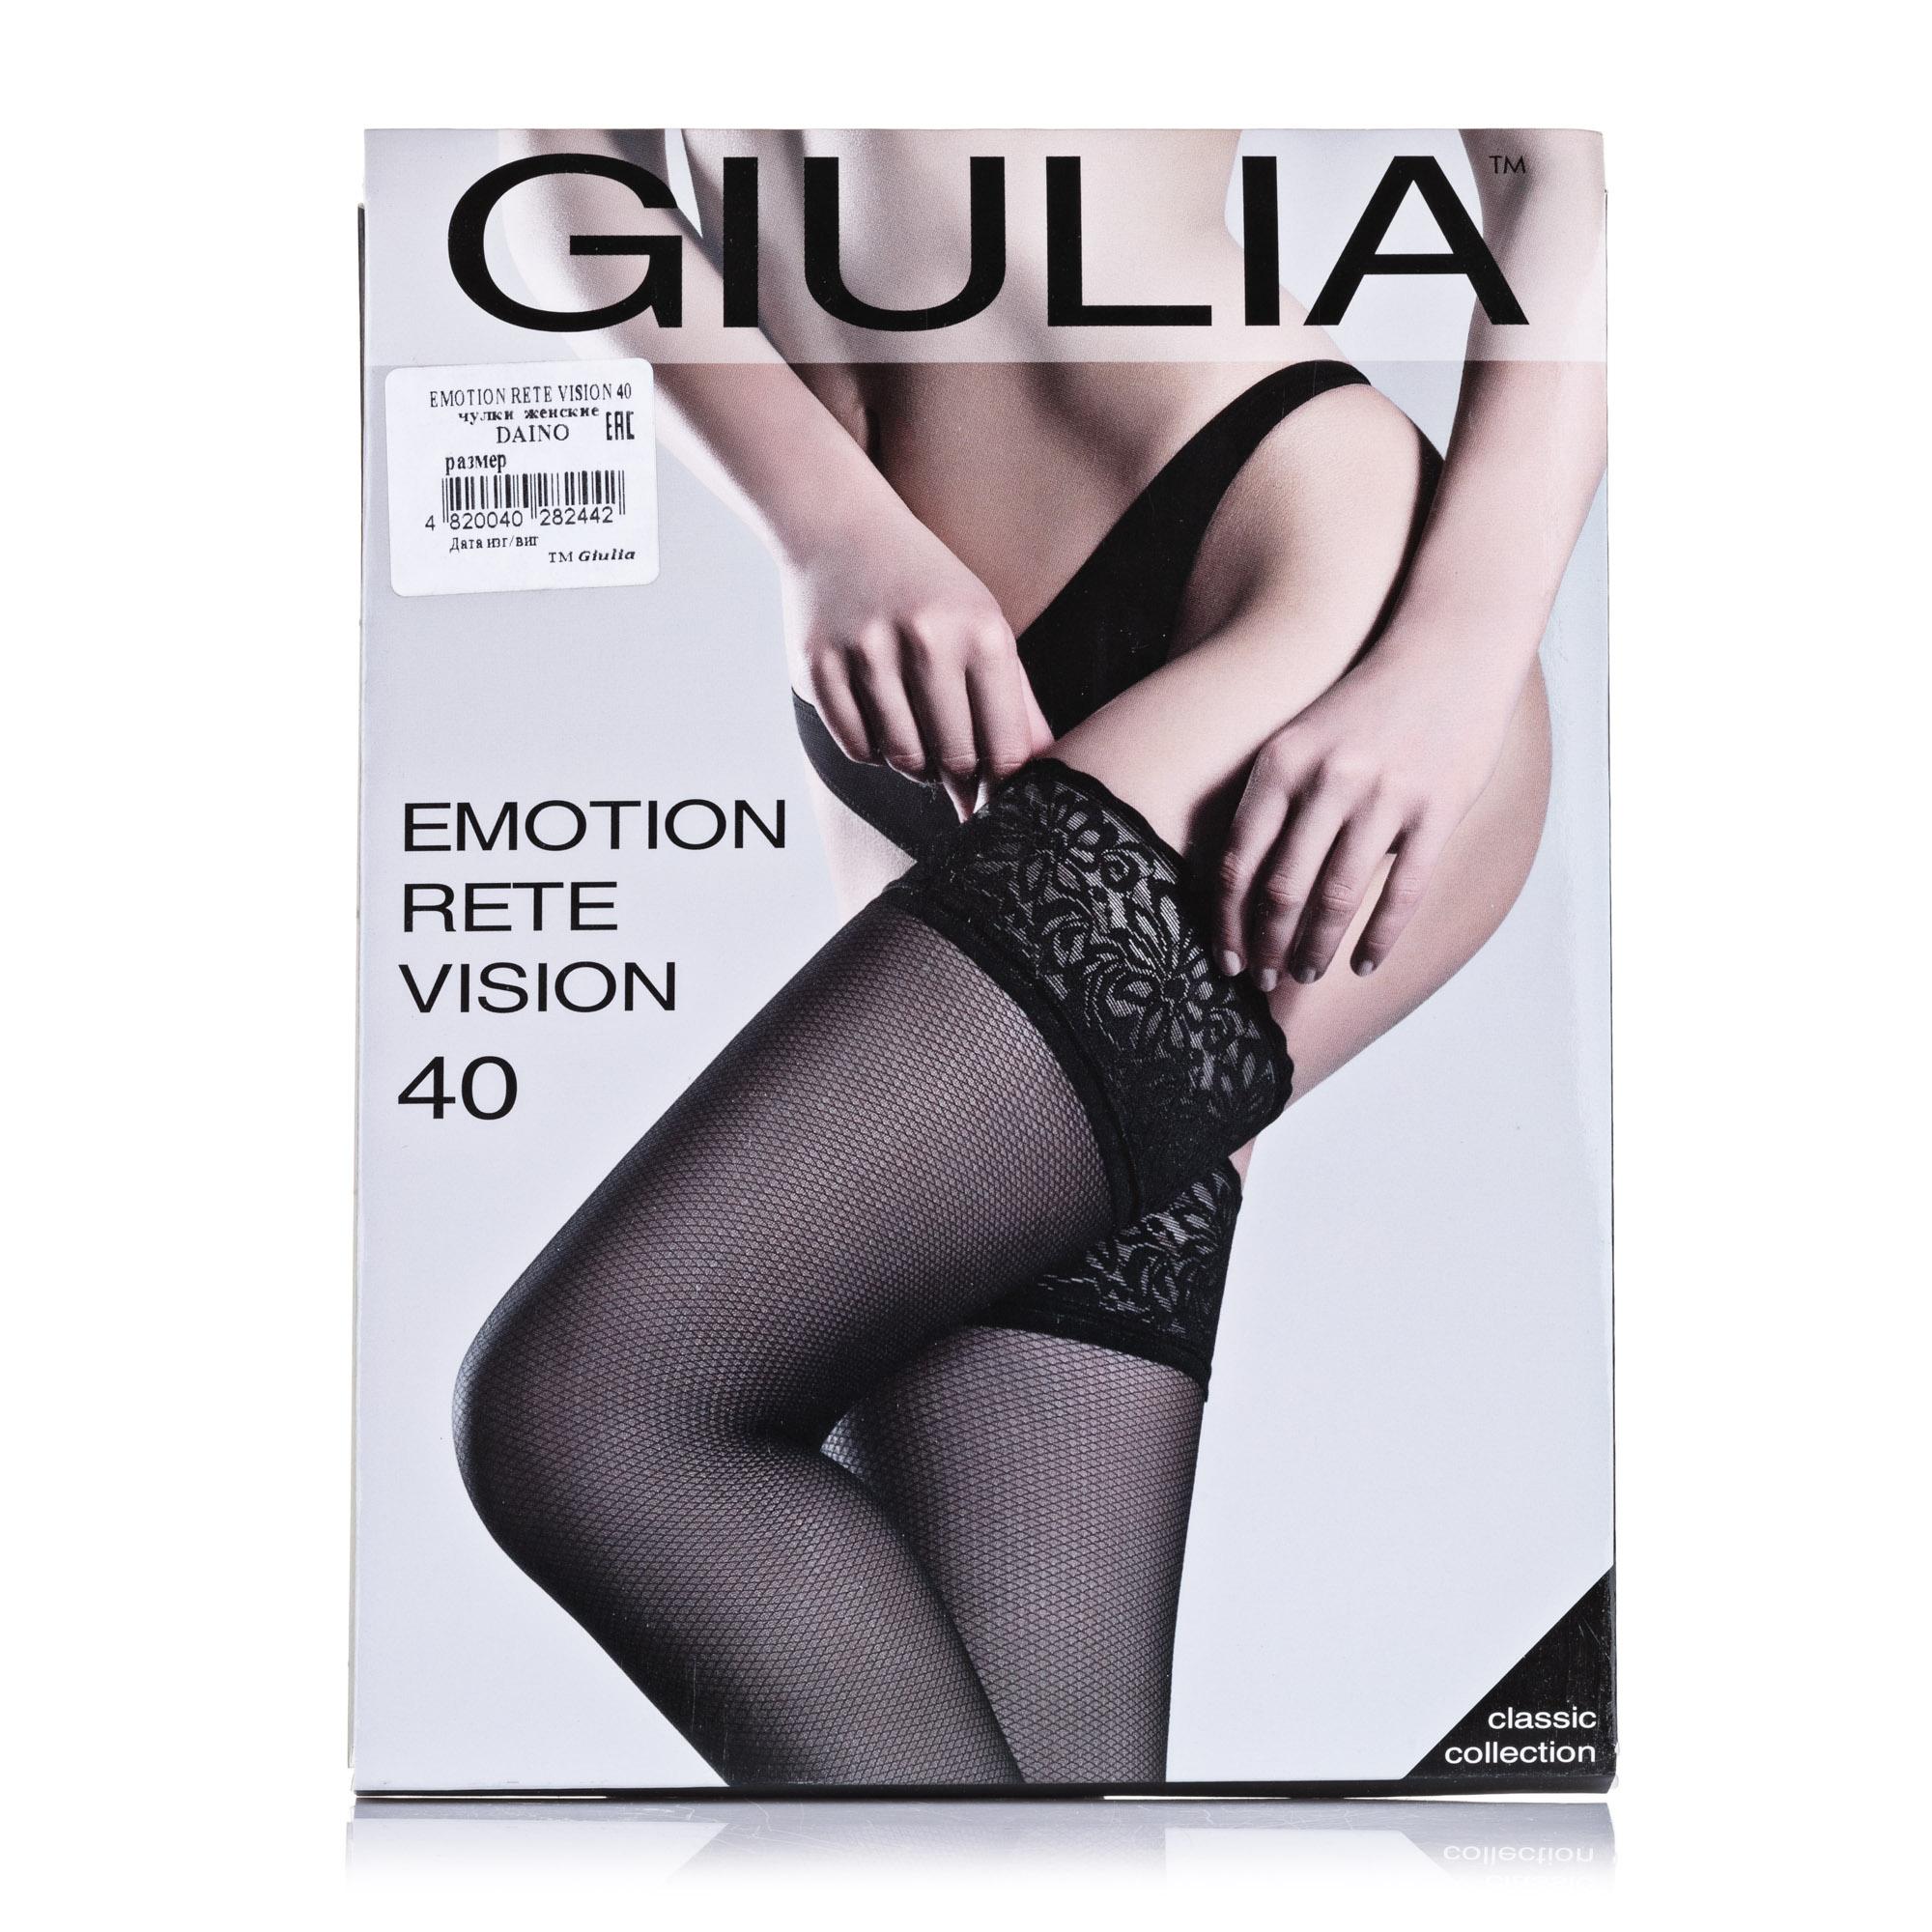 Чулки женские GIULIA EMOTION 40 ДЕН daino р.3-4